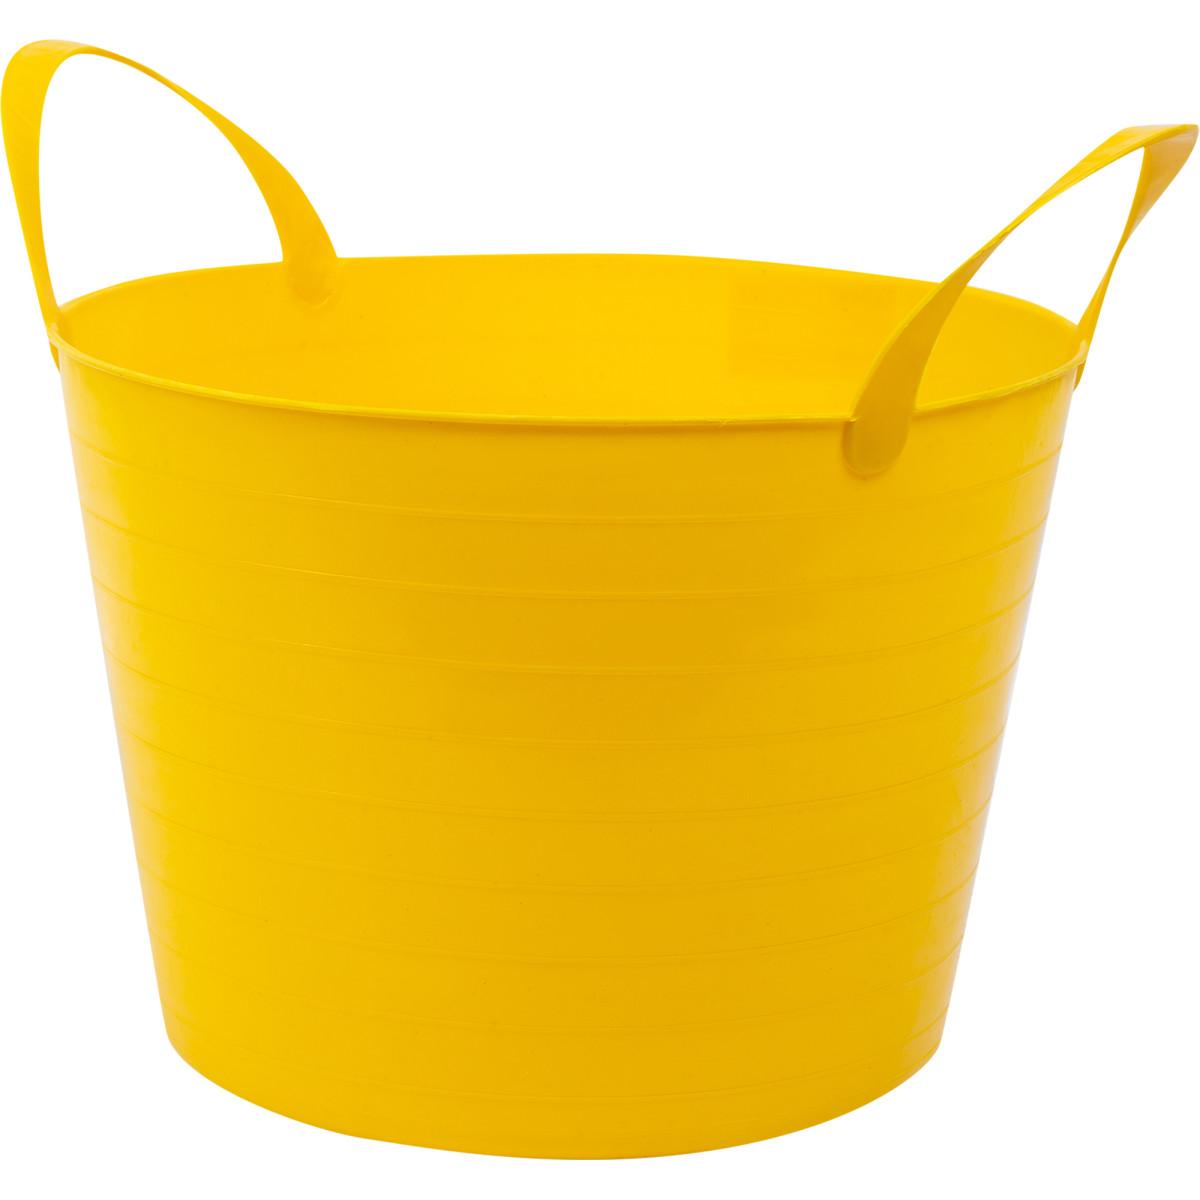 Ведро с ручками гибкое желтое 14 л мягкий пластик